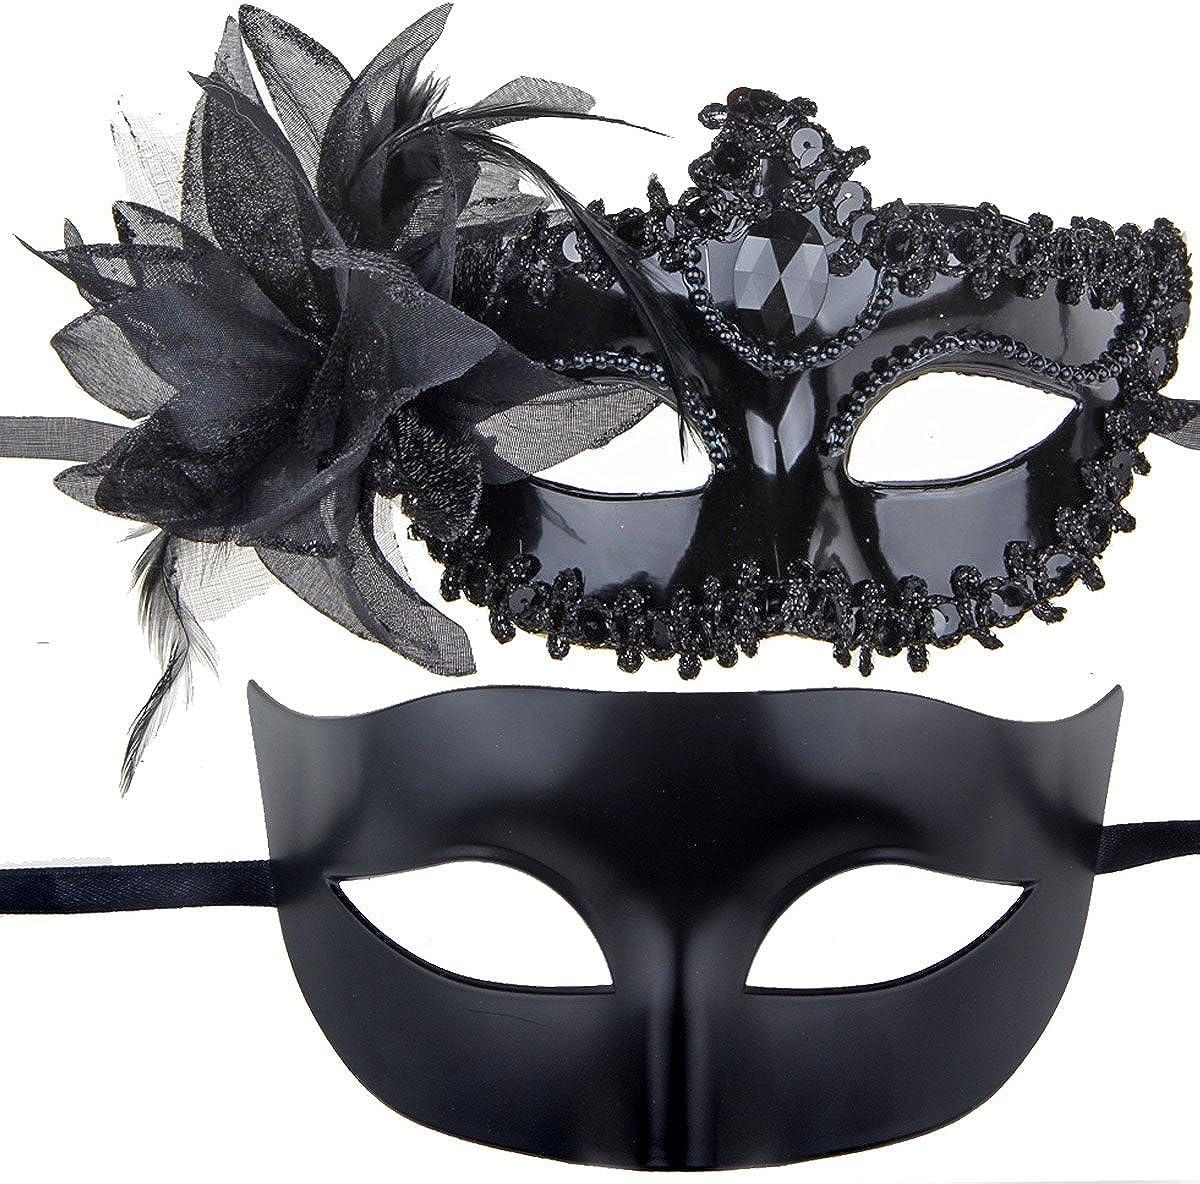 BLACK IETANG Couples Pair Half Venetian Masquerade Ball Mask Set Party Costume Accessory